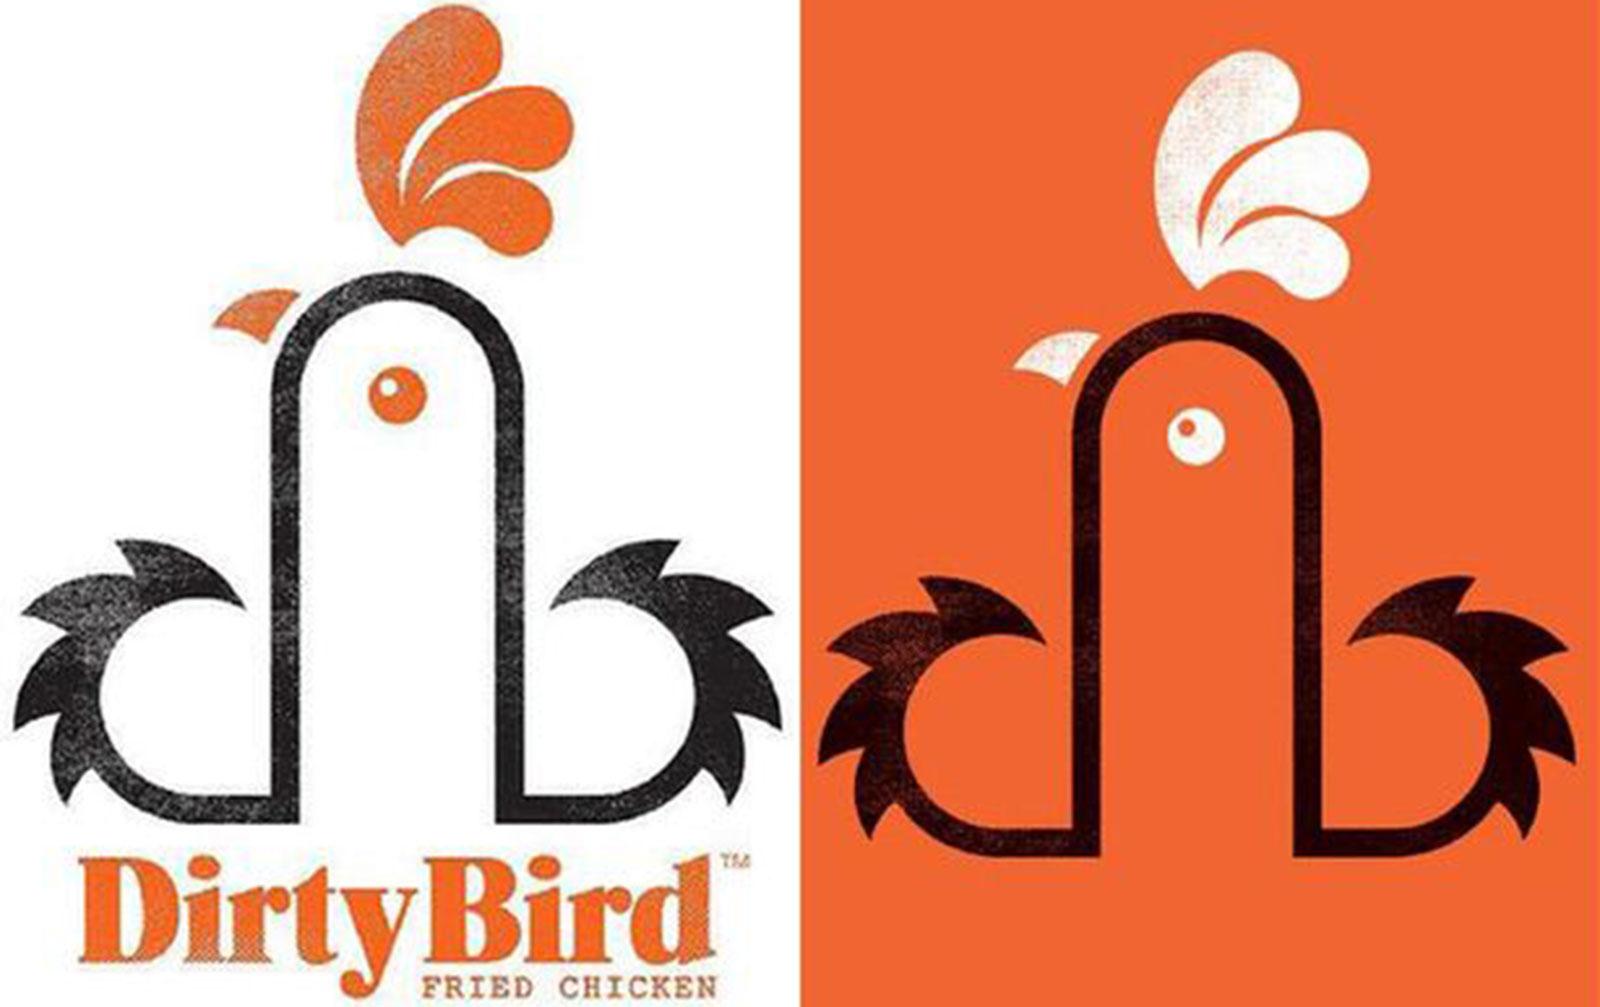 Dirty Bird logo - crude but clever | Blog | Amplify PR